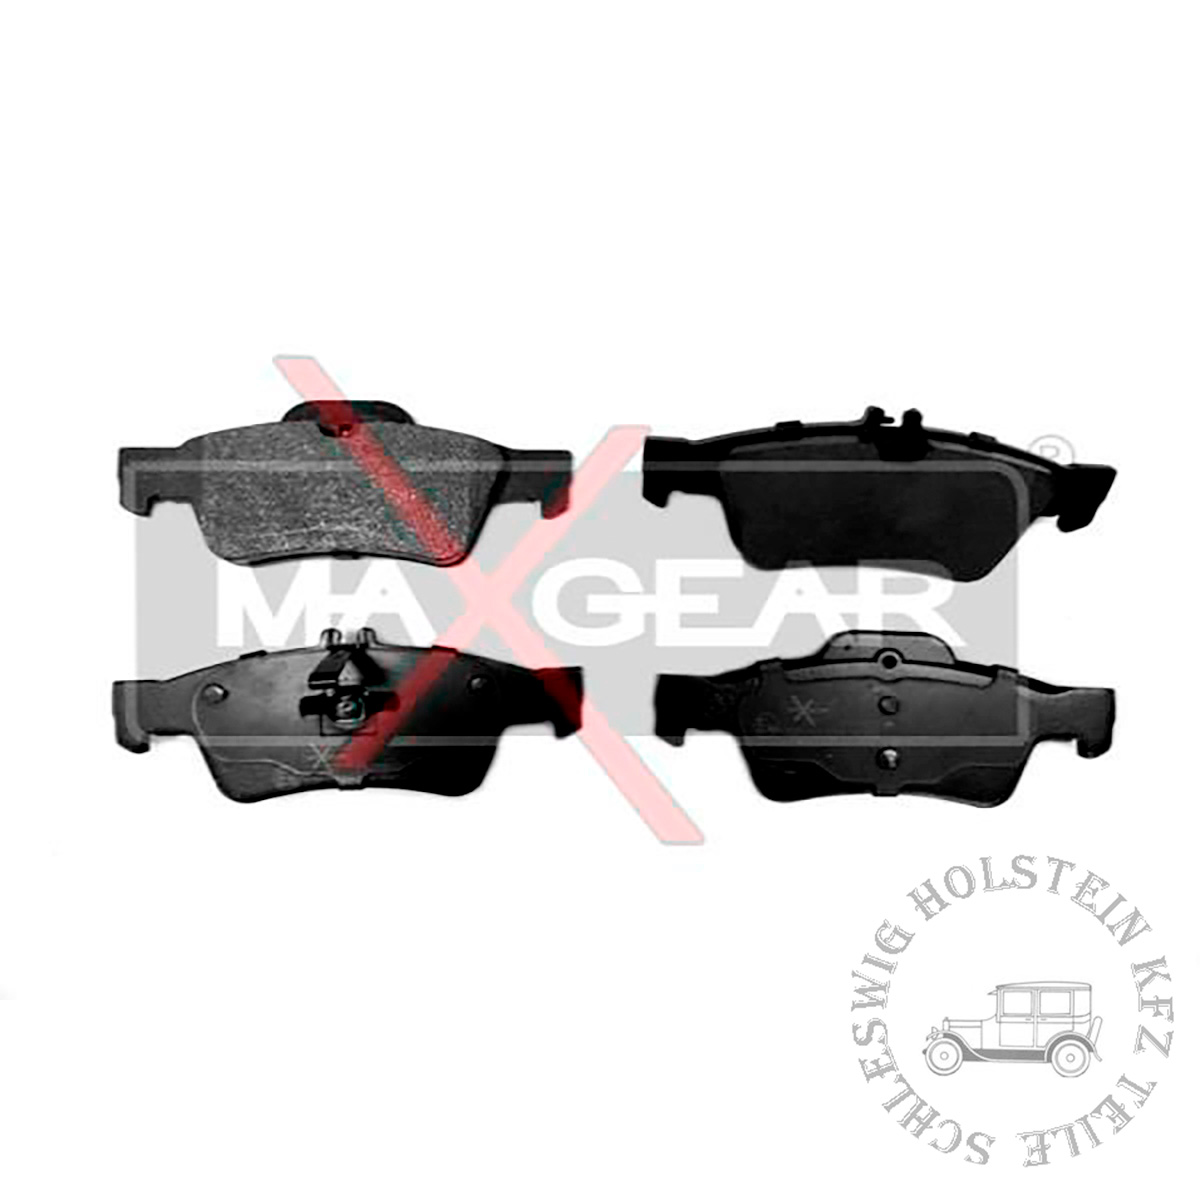 Bremsbelagsatz Hinten für MERCEDES-BENZ E-CLASS (W212) E 300 CDI / BlueTEC